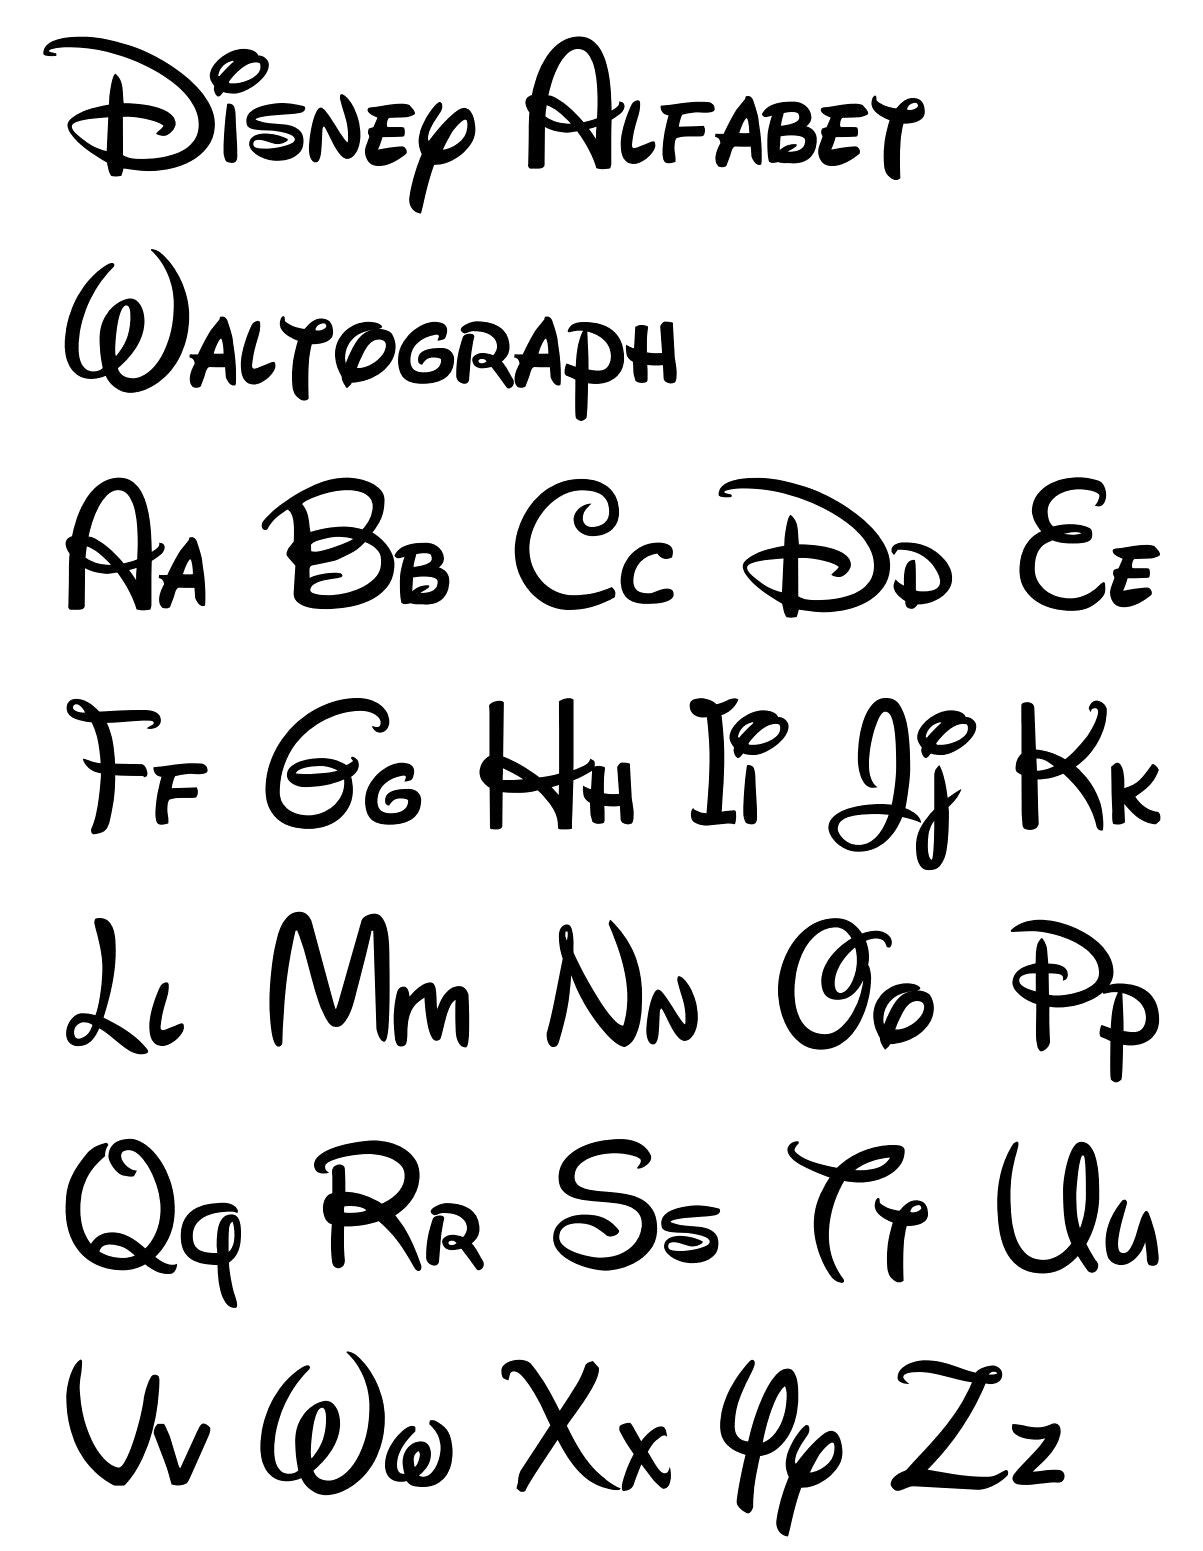 Free Printable Disney Letter Stencils | Disney In 2019 | Disney - Free Printable Fonts Stencils